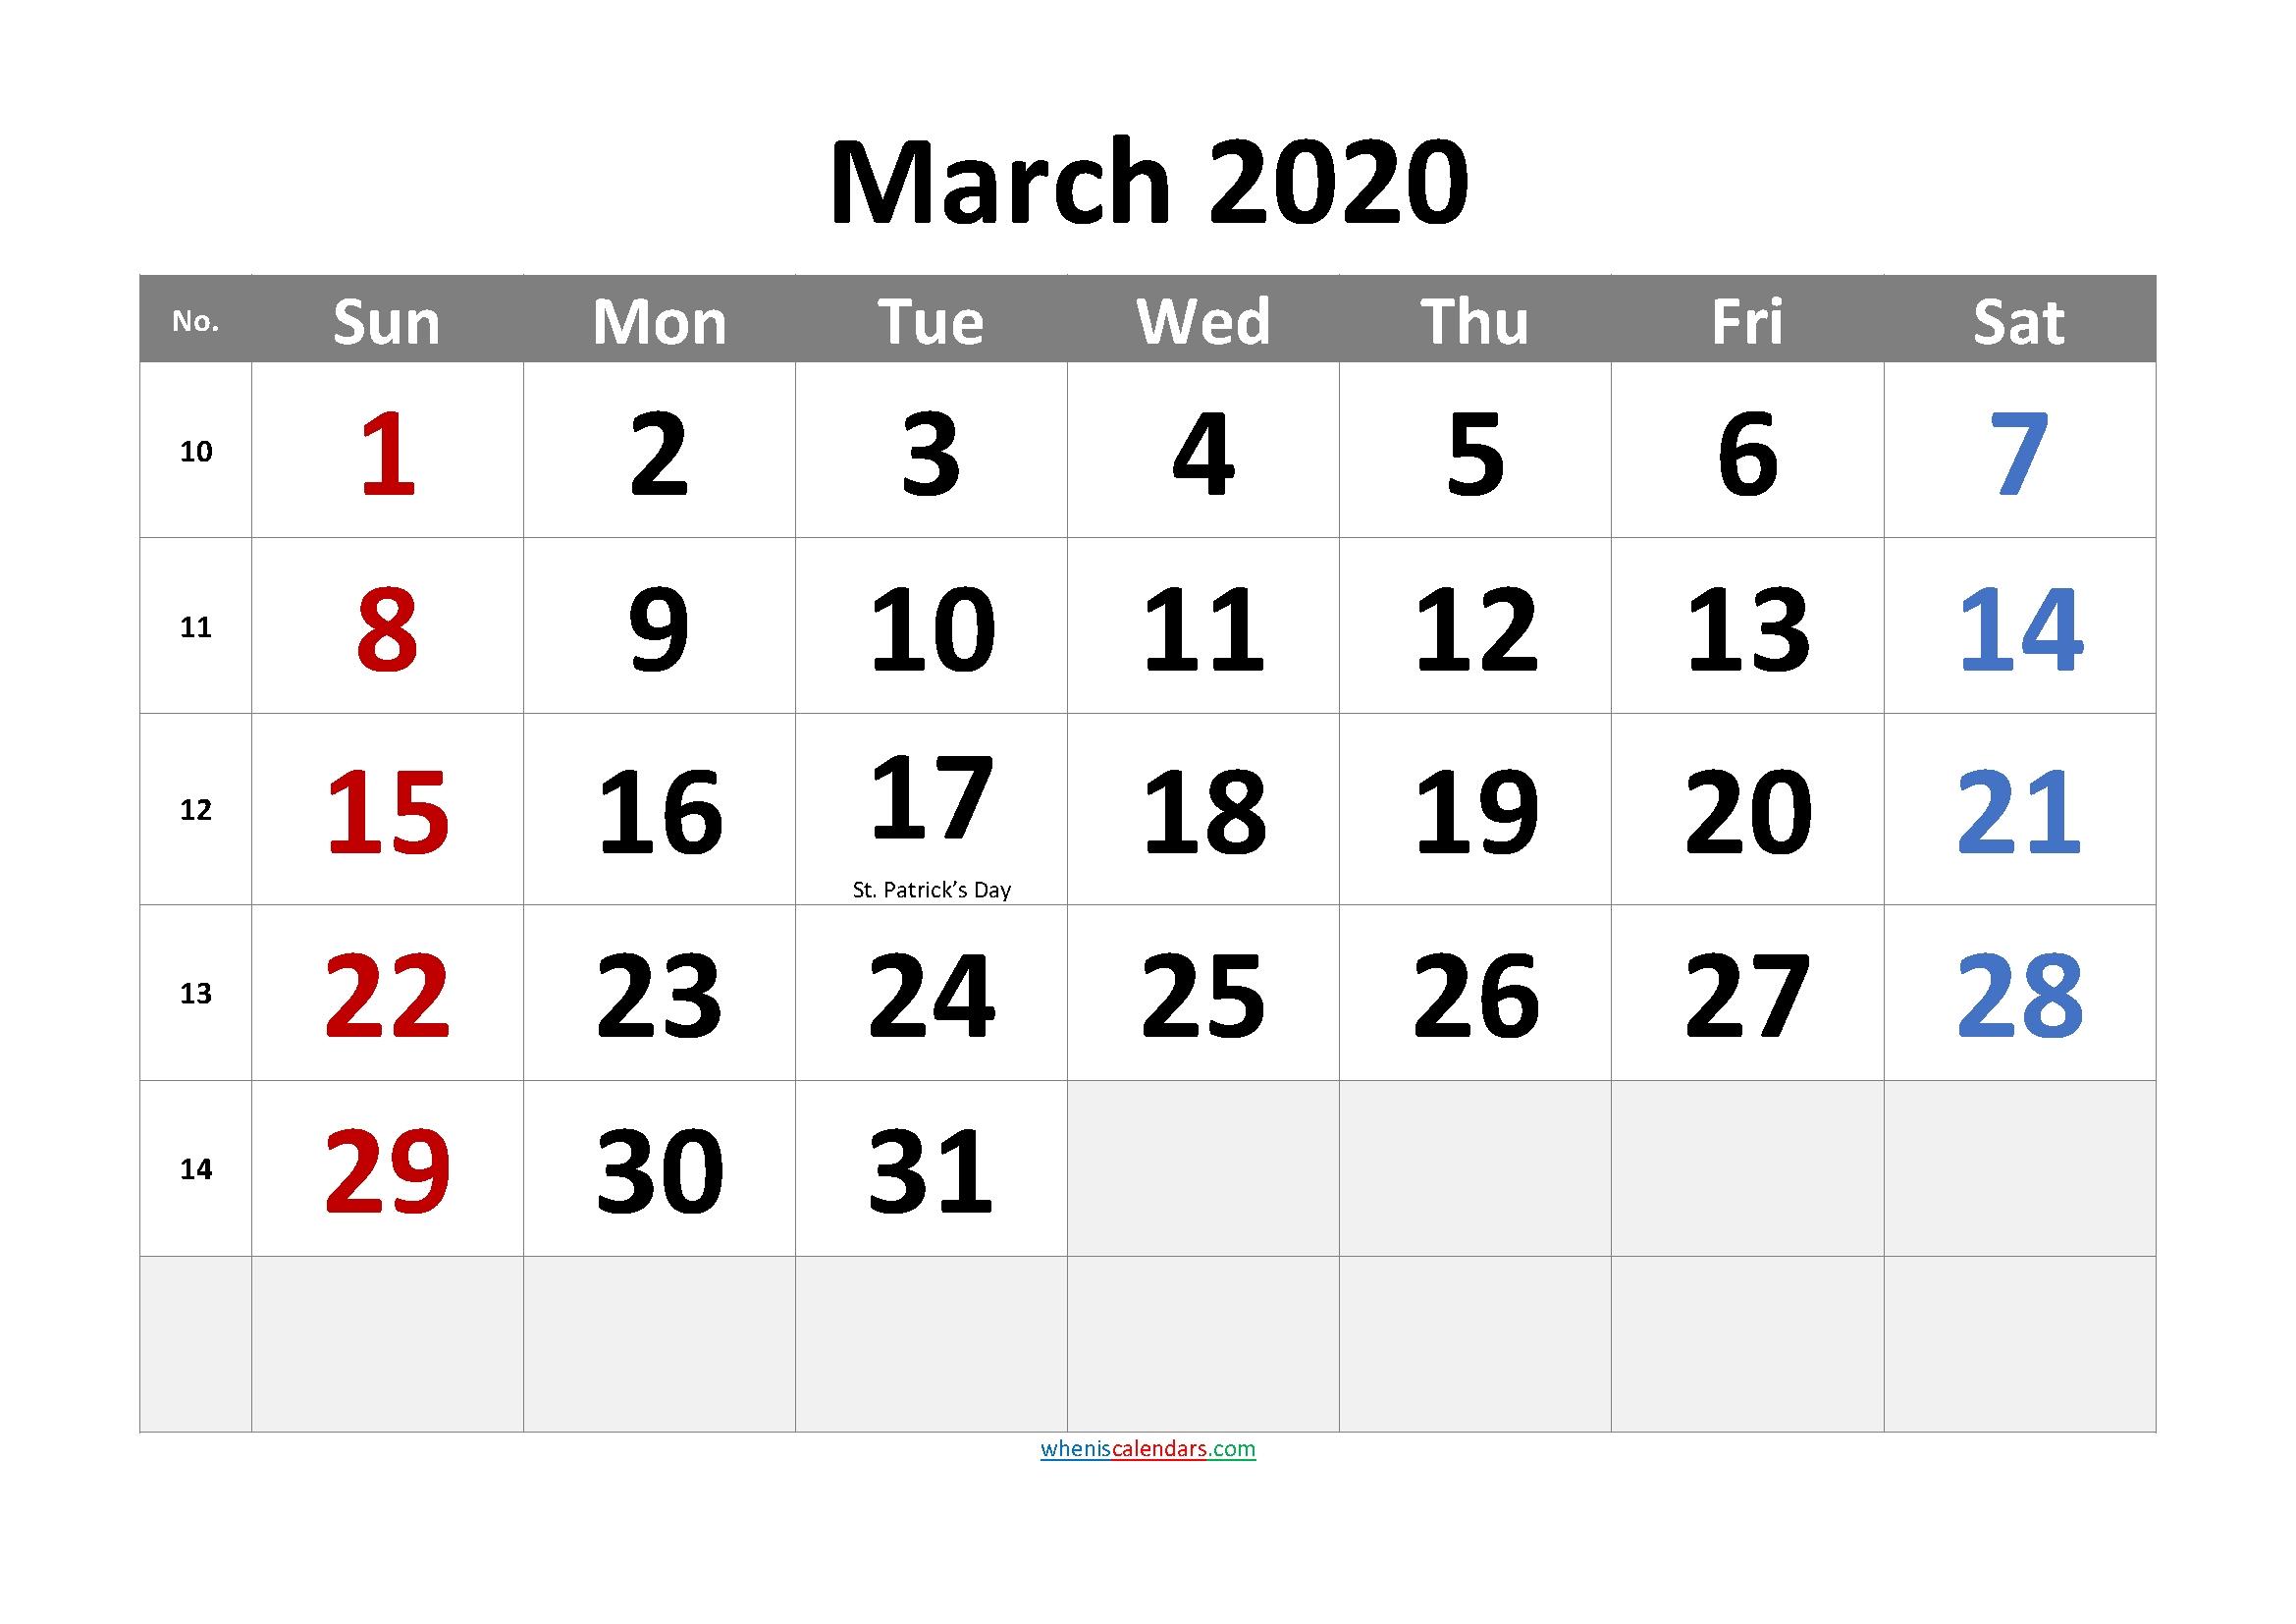 November 2020 Printable Calendar With Holidays - 6 Templates - Free Printable 2021 Monthly November 2020 - March 2021 Calendar